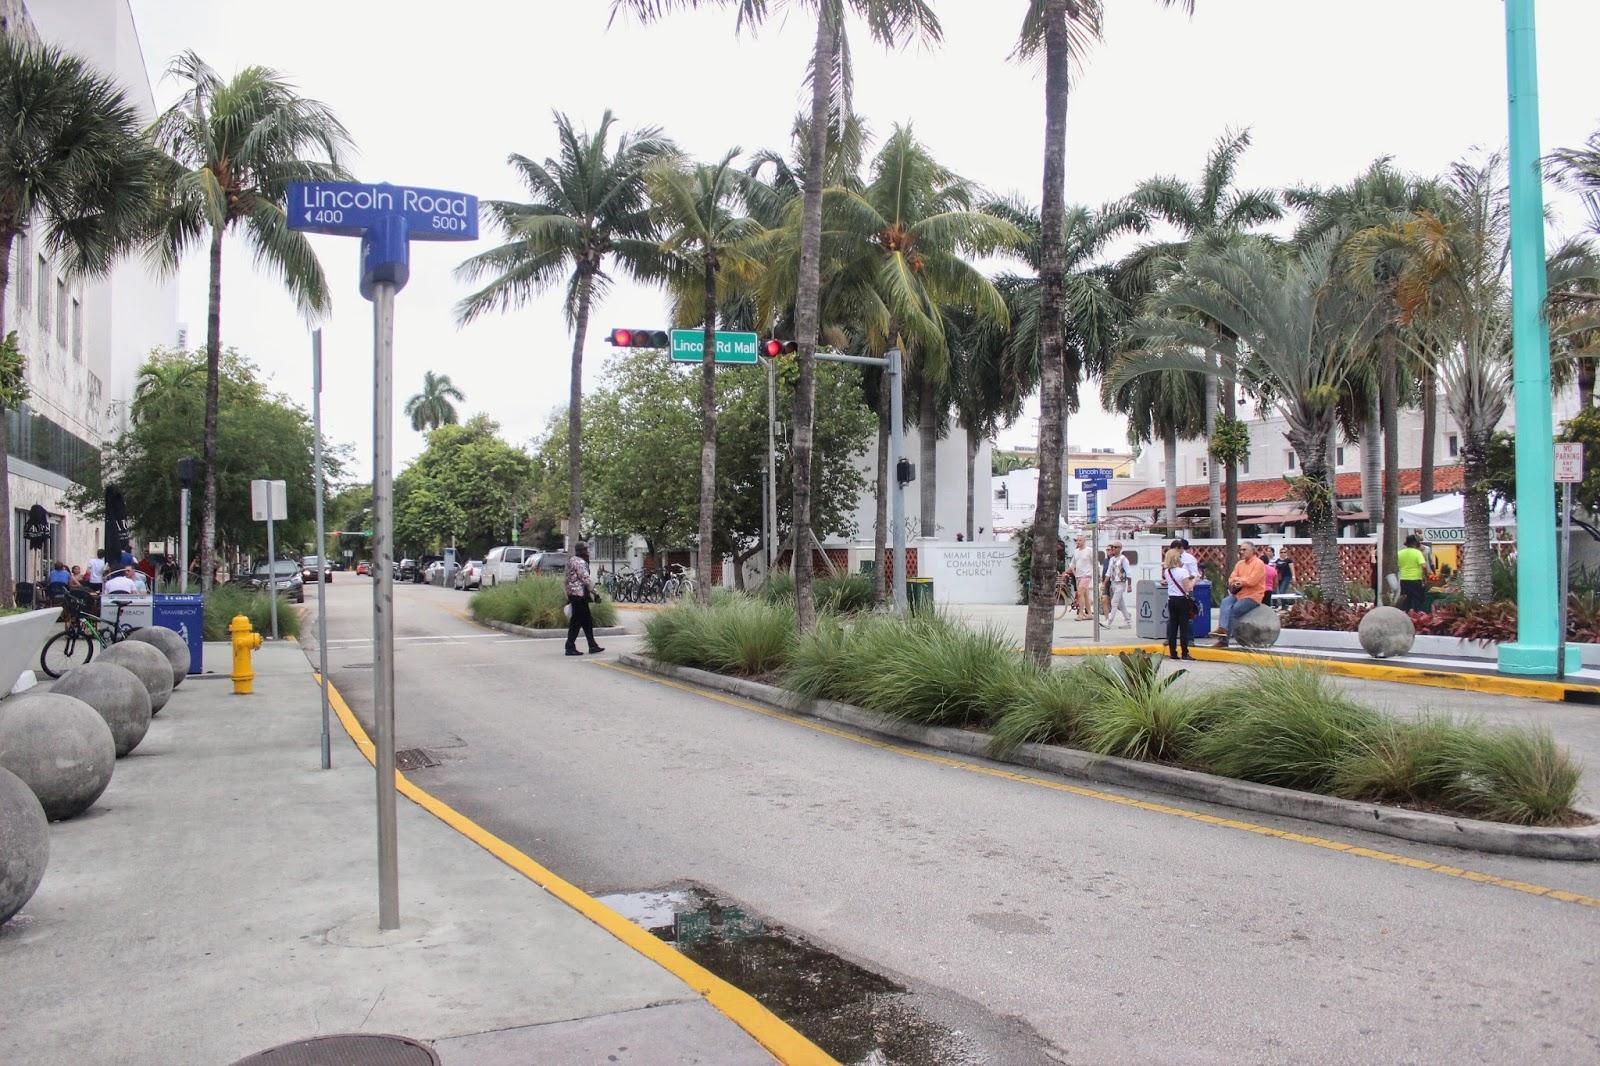 lifesthayle-miami-photodiary-lincoln-road.jpg